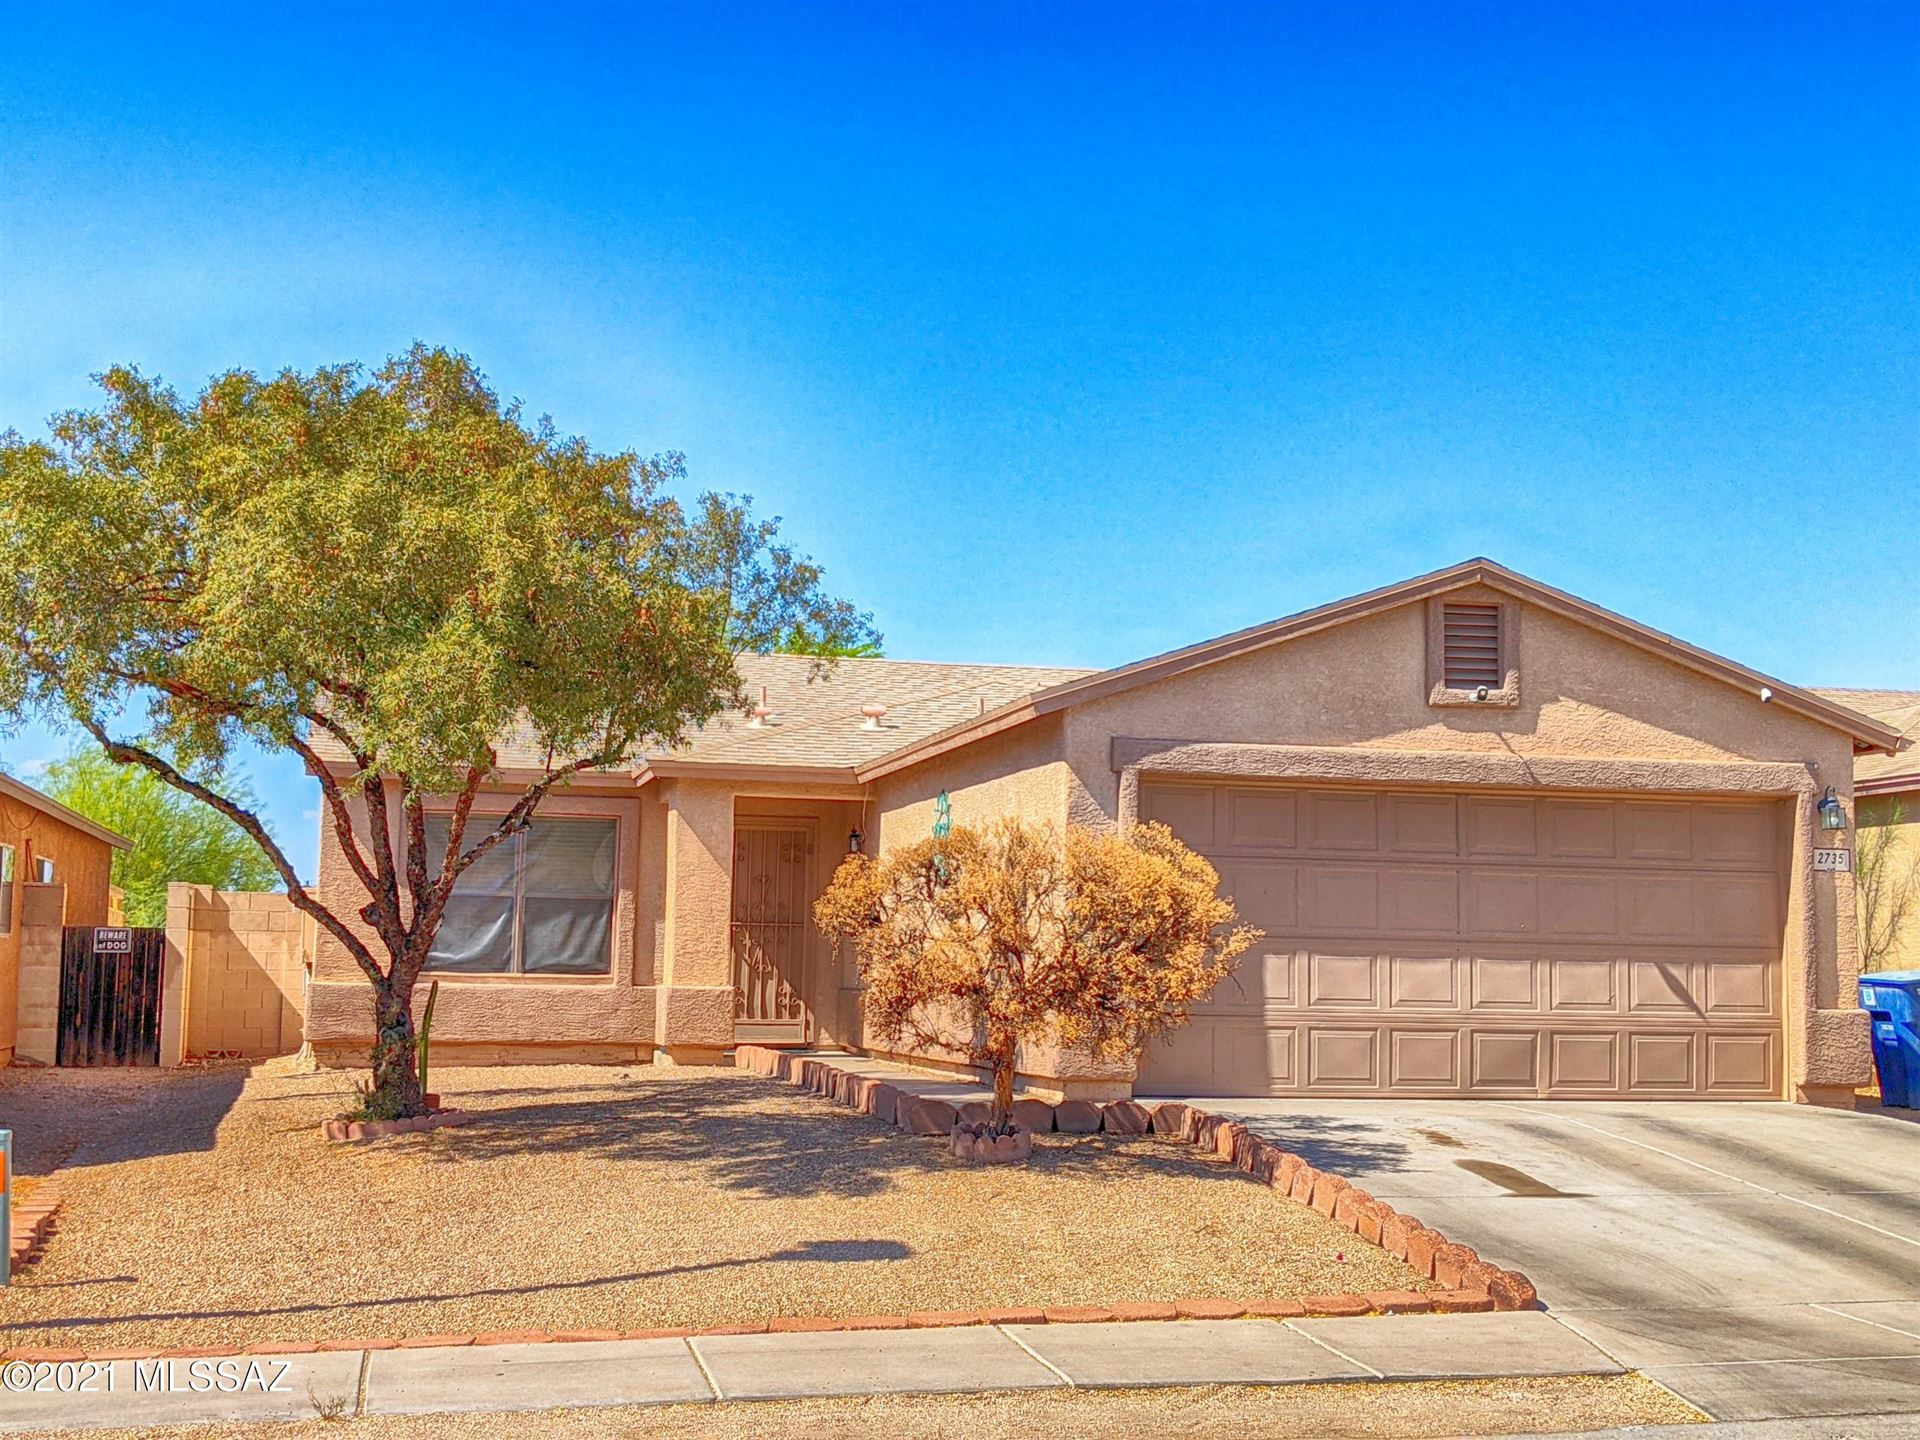 2735 E Liverpool Drive, Tucson, AZ 85706 - MLS#: 22118494